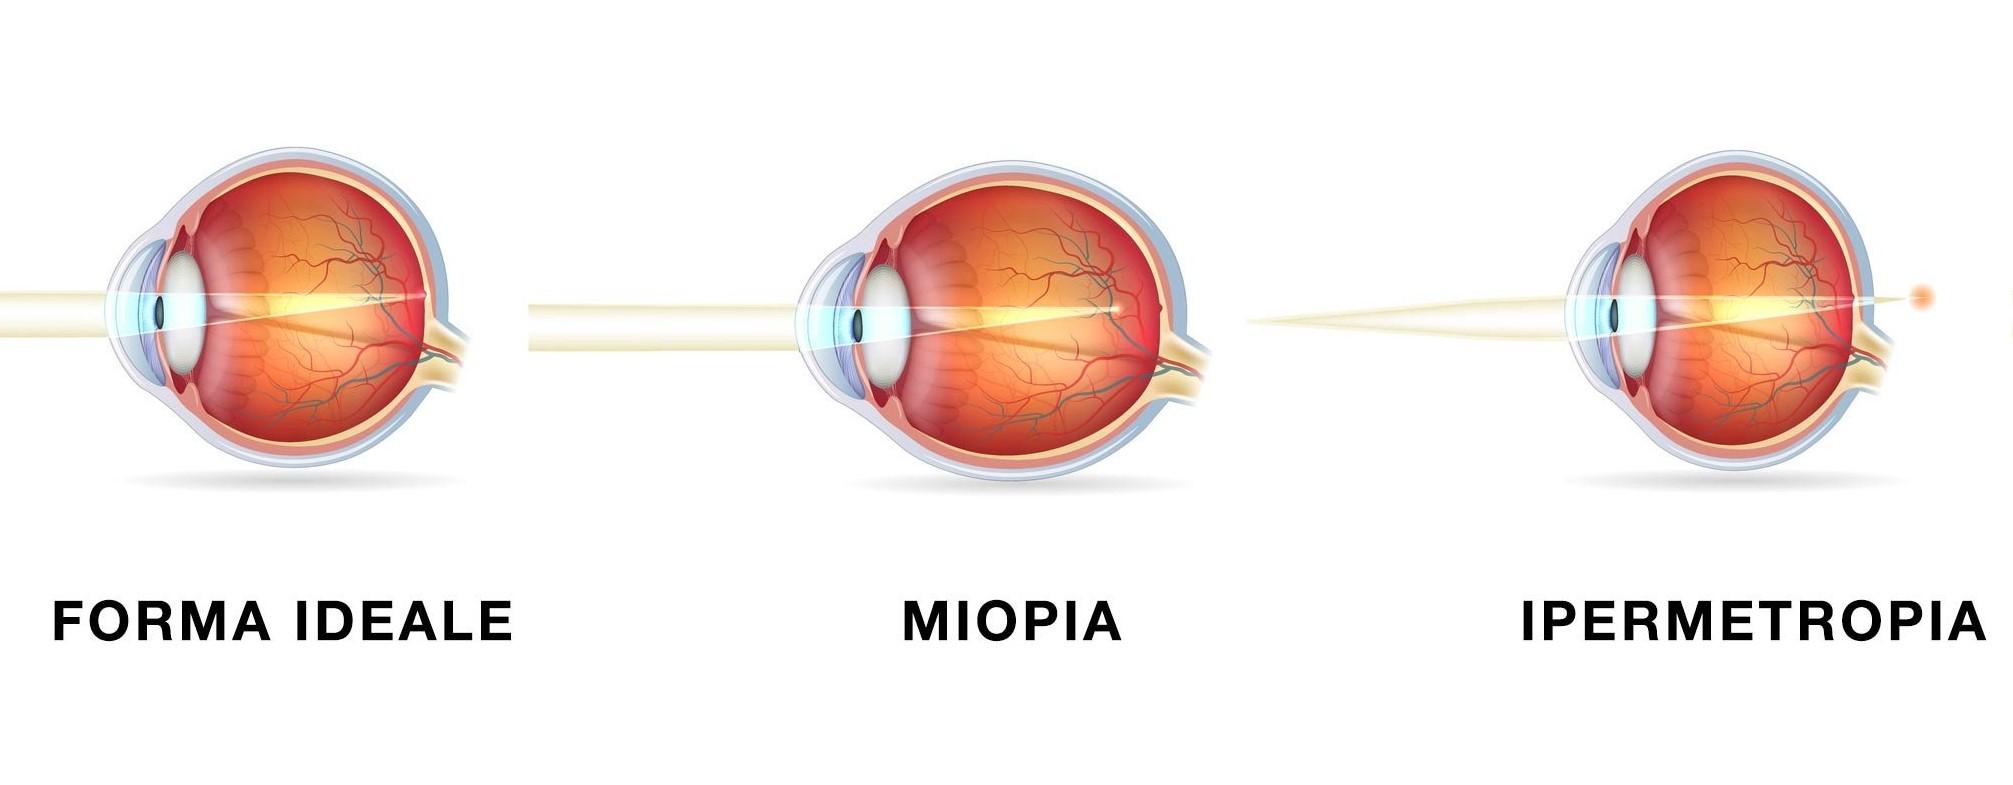 occhio-miope